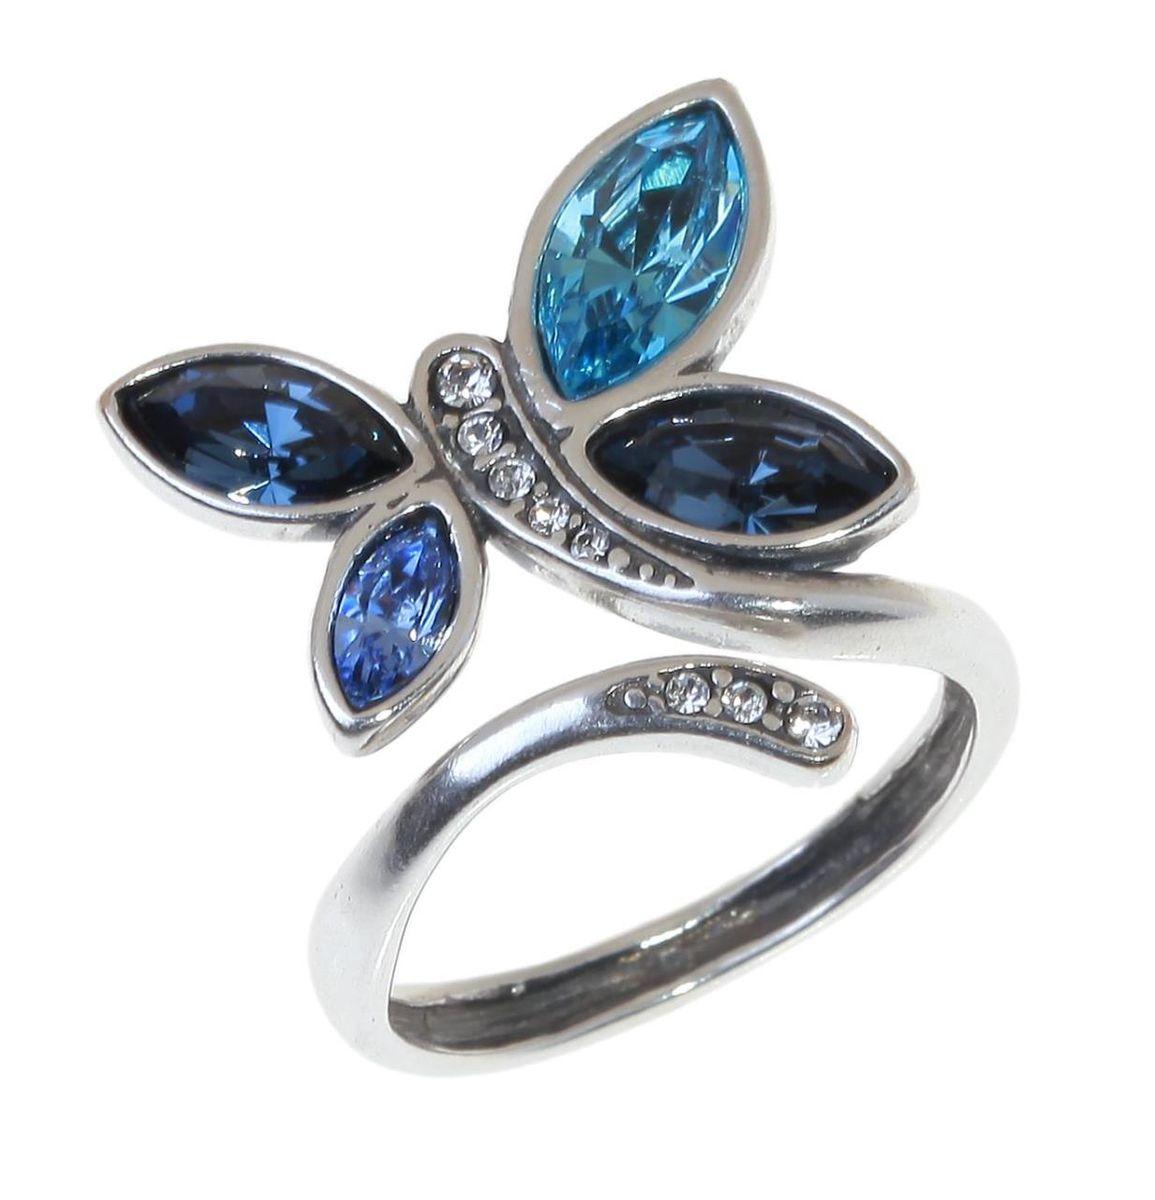 Кольцо Jenavi Доминика, цвет: серебряный, голубой. e8763040